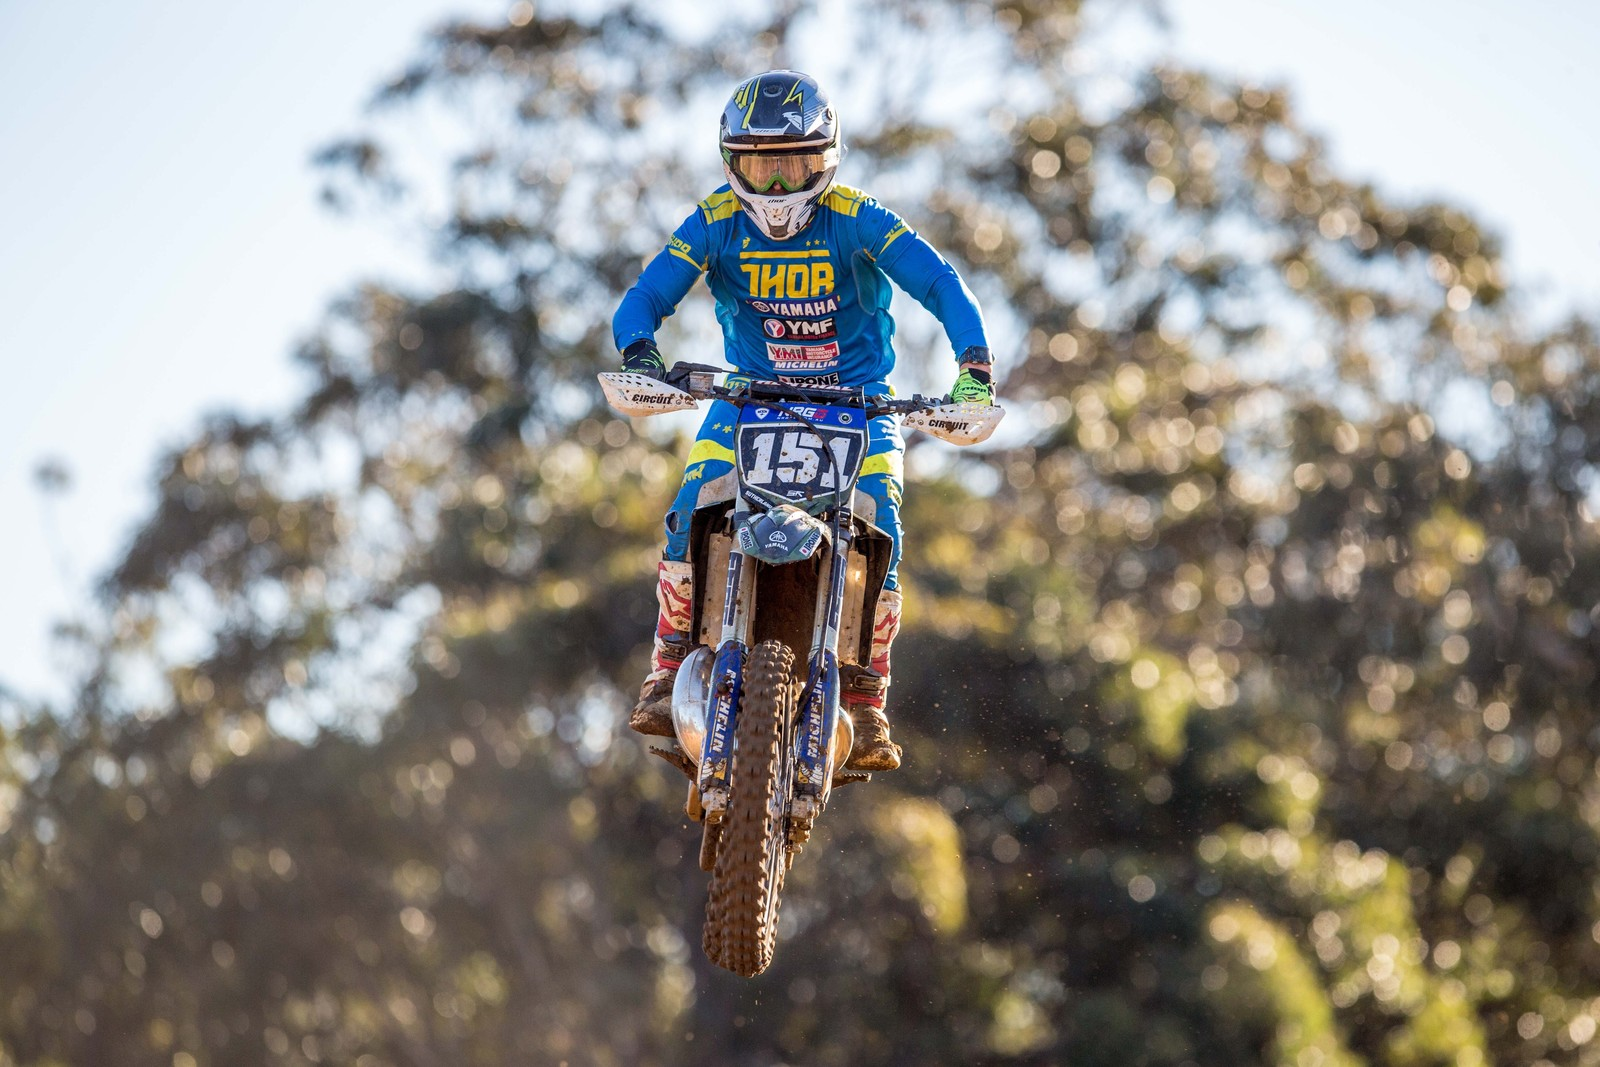 Nick Sutherland - Australian Motul MX Championships: Round 6, Nowra - Motocross Pictures - Vital MX